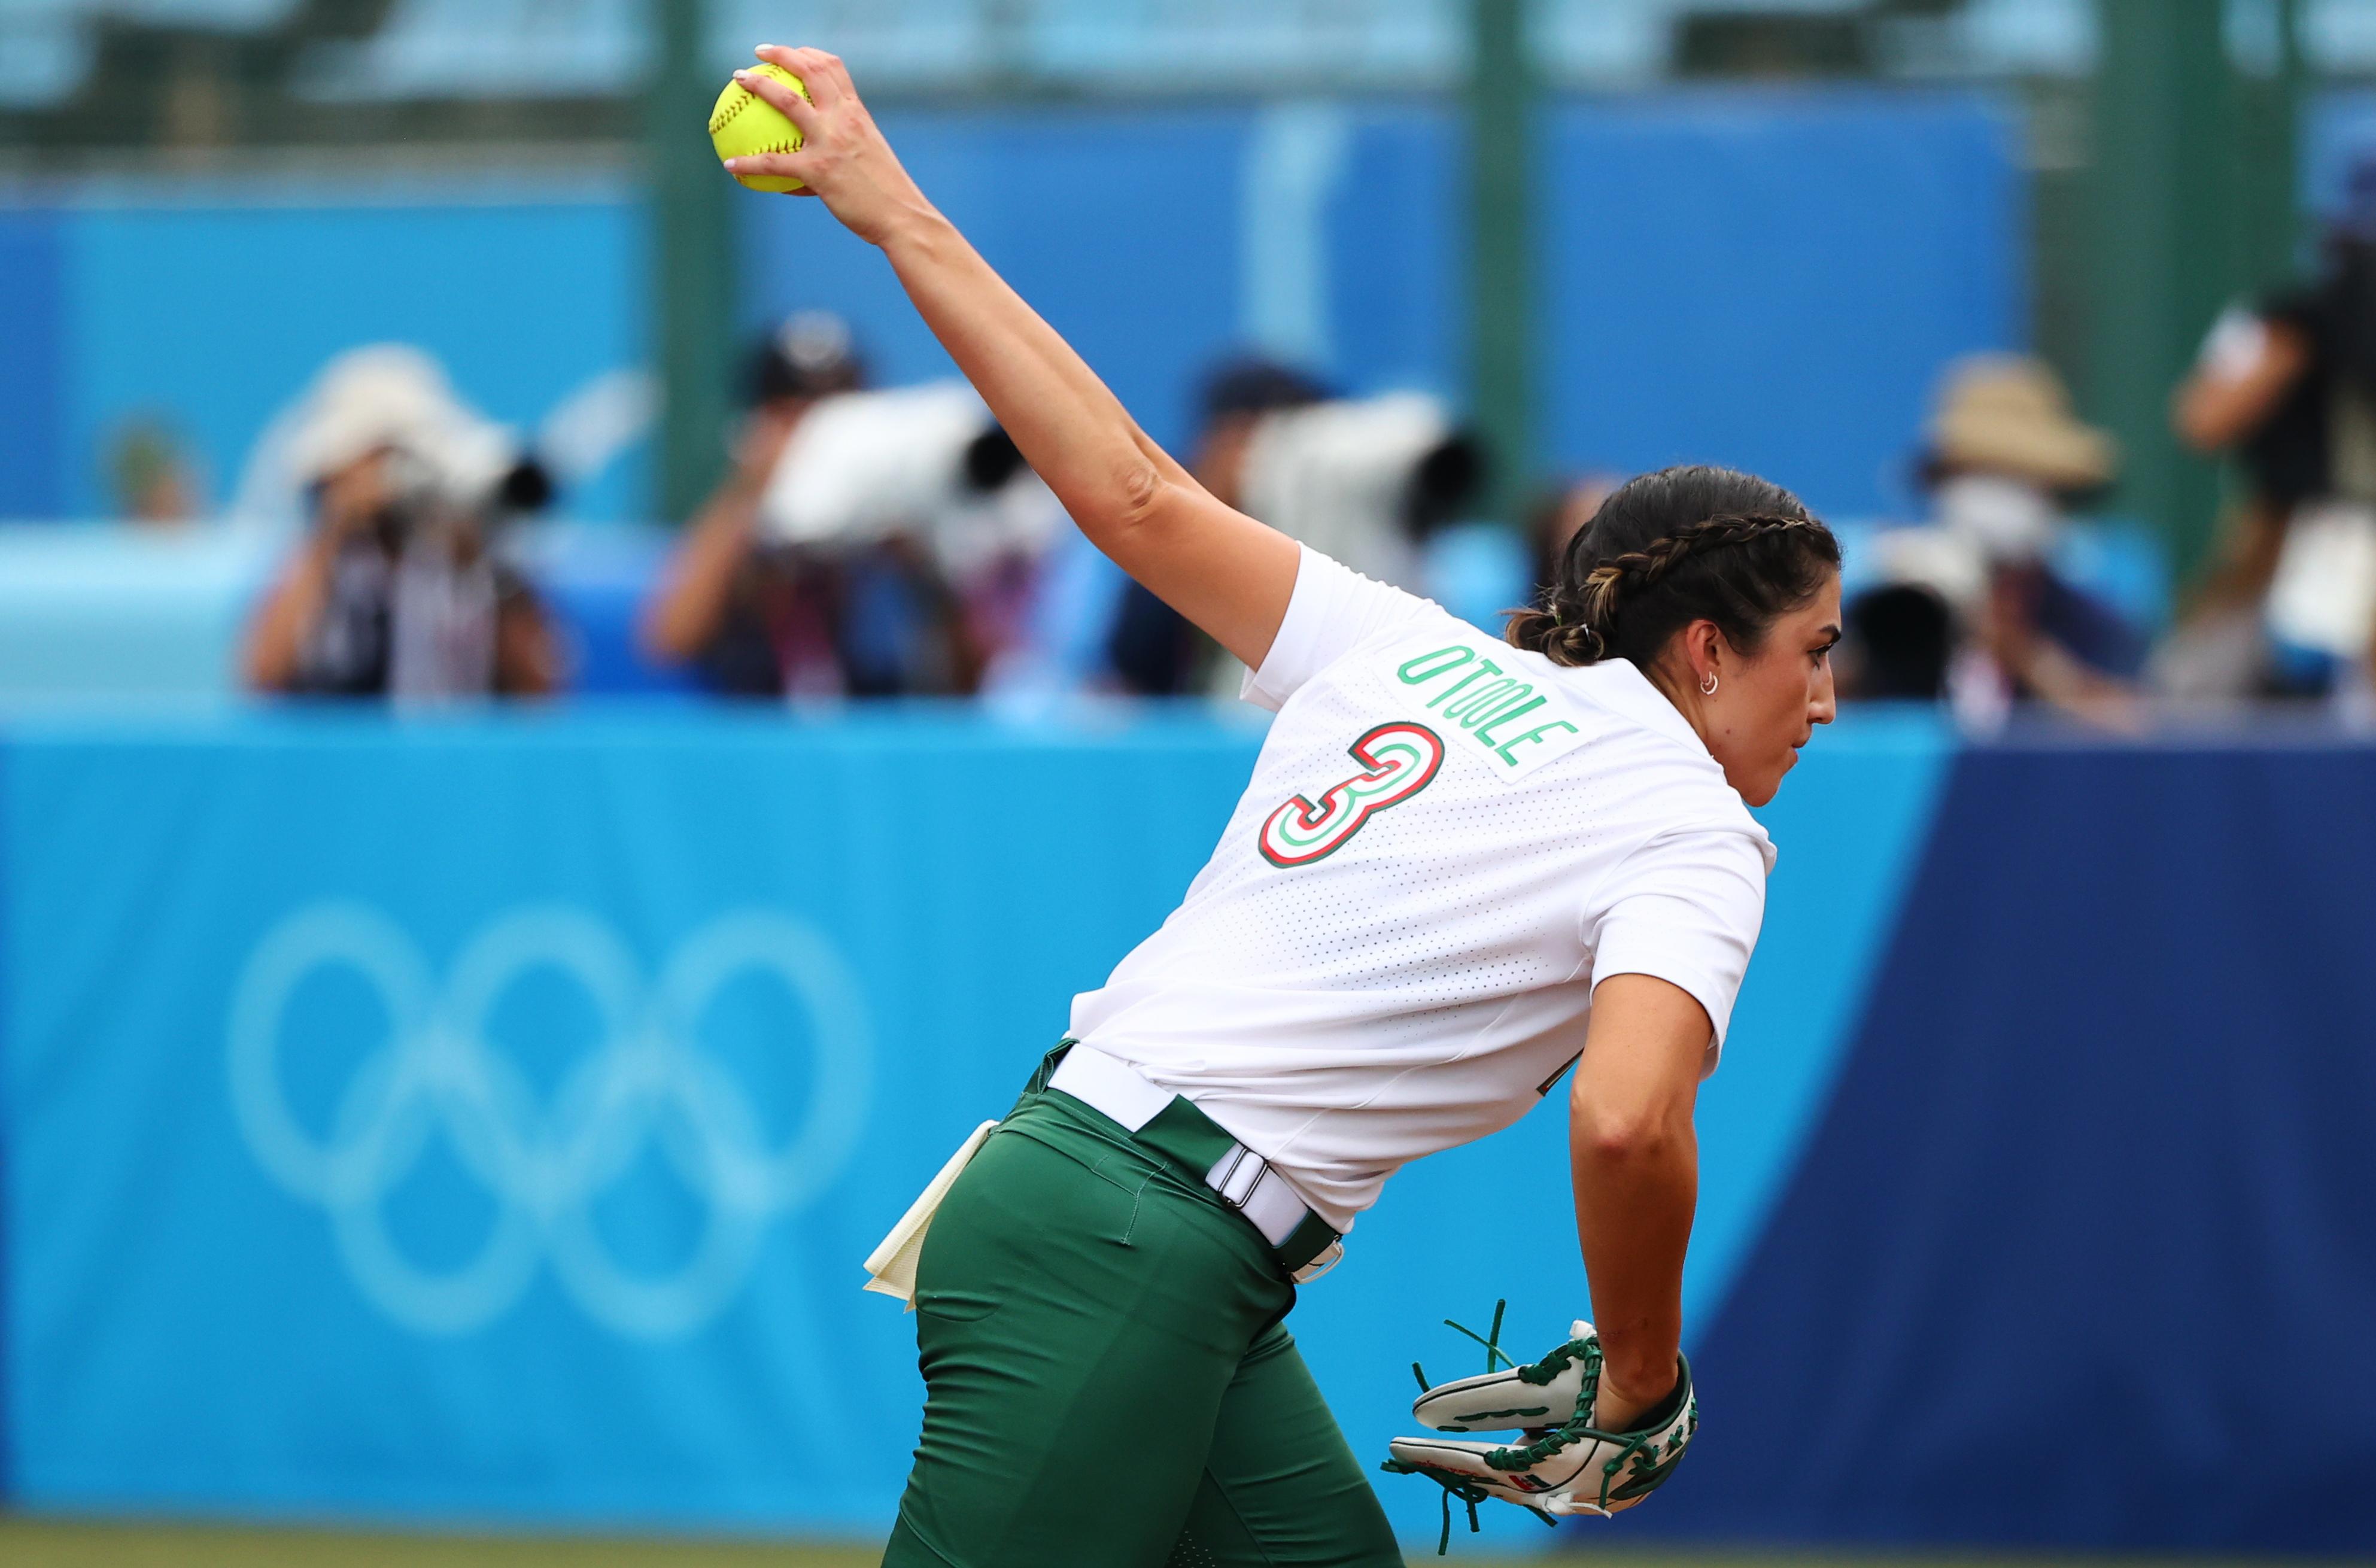 Tokyo 2020 Olympics - Softball - Women - Opening Round - Mexico v Japan - Fukushima Azuma Baseball Stadium - Fukushima, Japan - July 22, 2021. Danielle O'Toole of Mexico in action. REUTERS/Jorge Silva